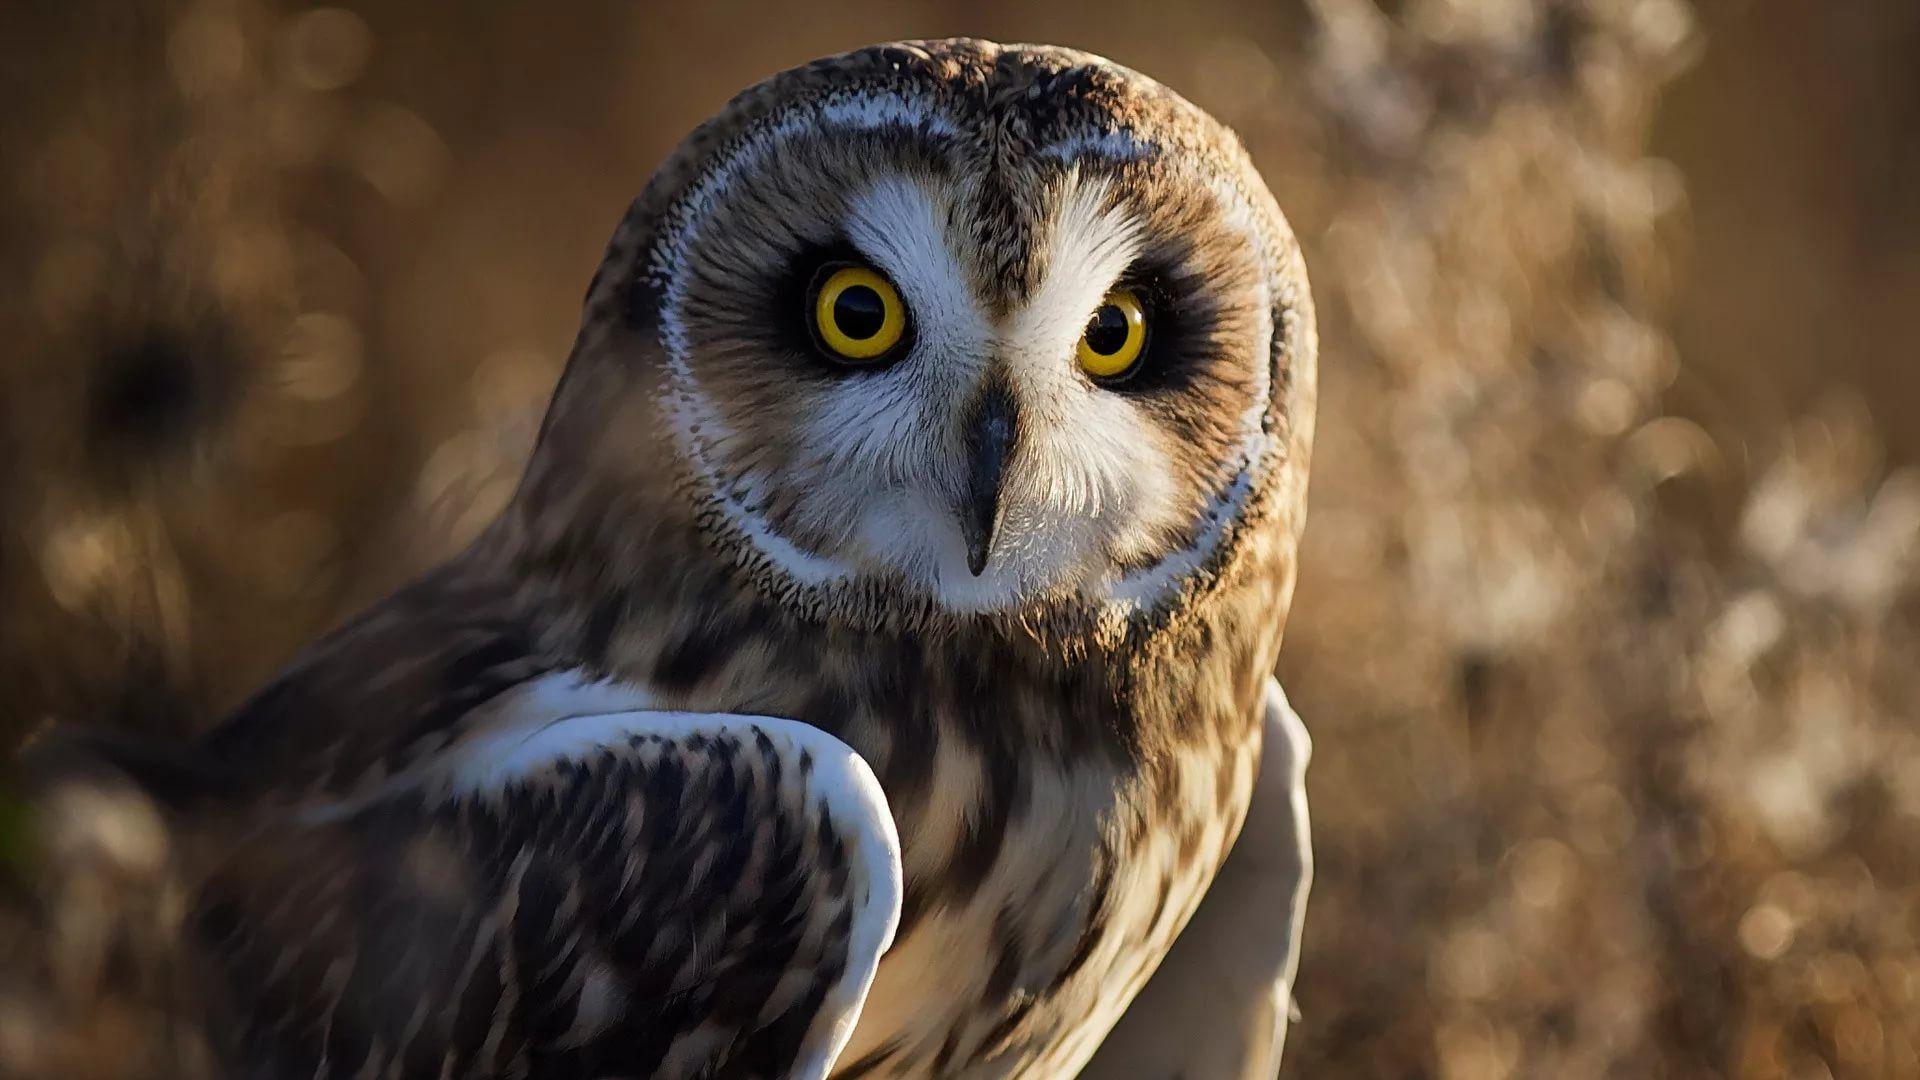 Cute Owl wallpaper picture hd